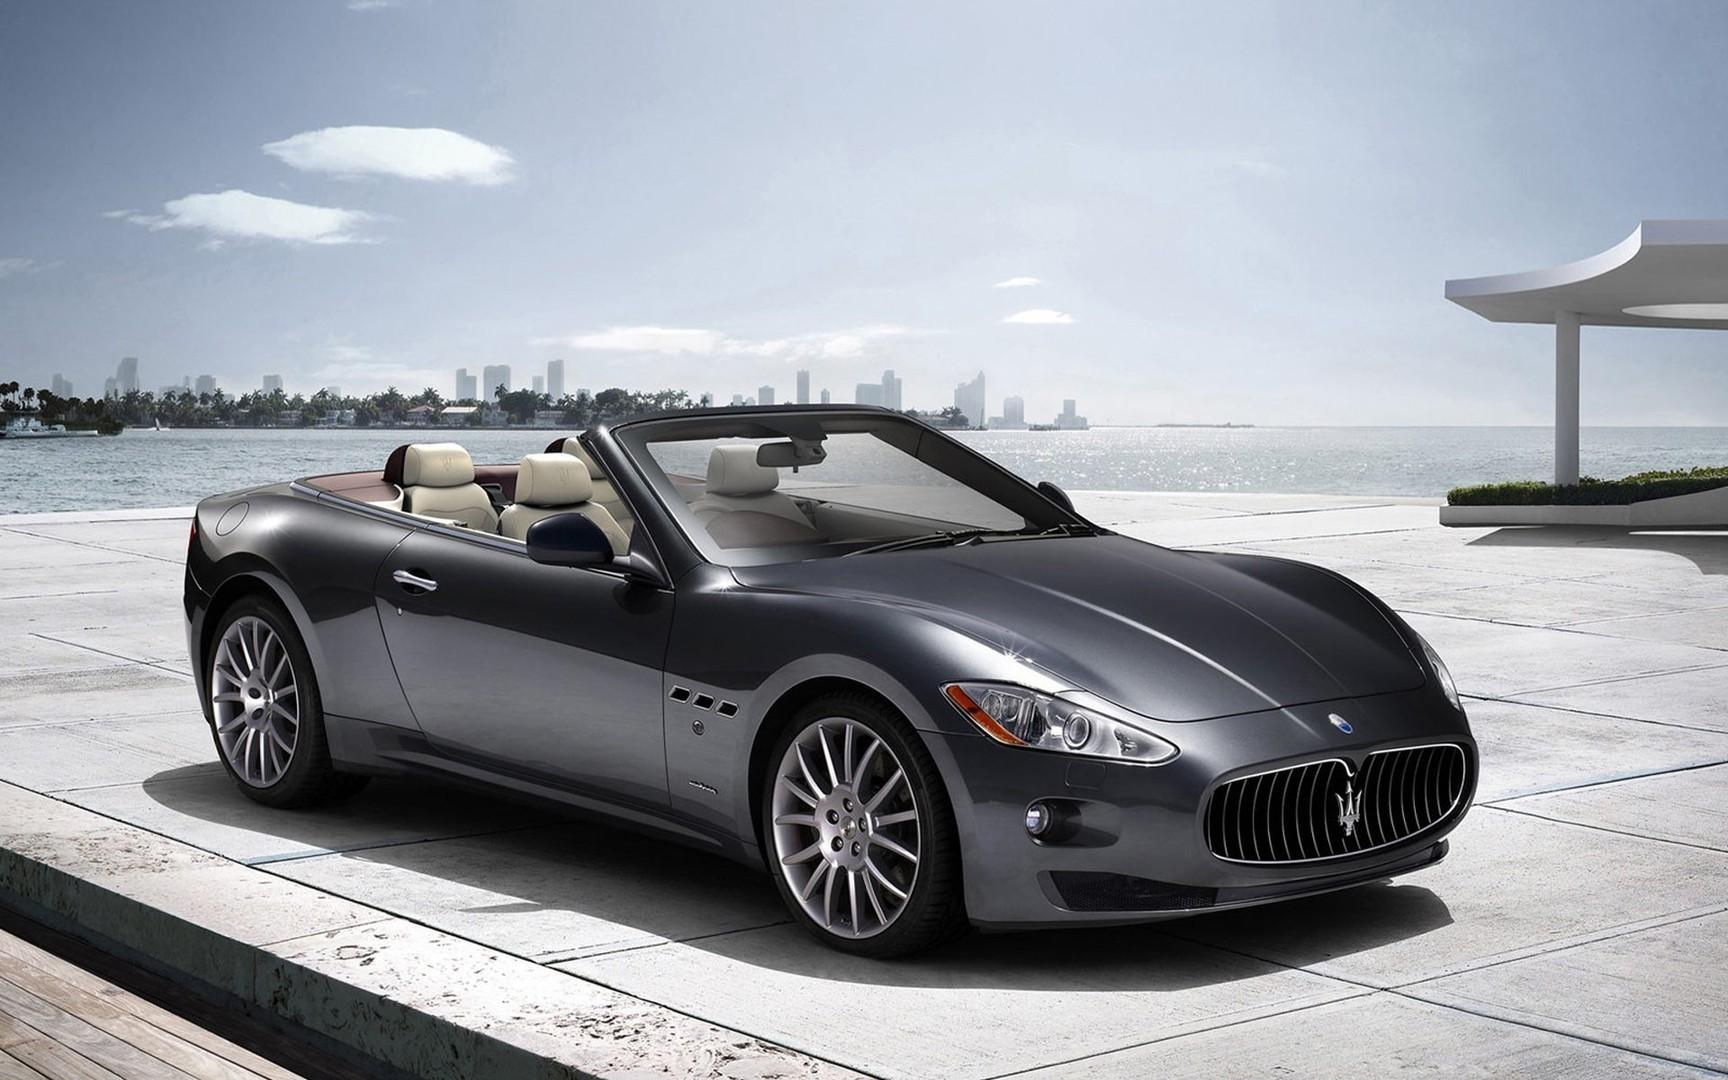 Convertible Maserati GranTurismo wallpaper Pictures Photos Images Desktop Download